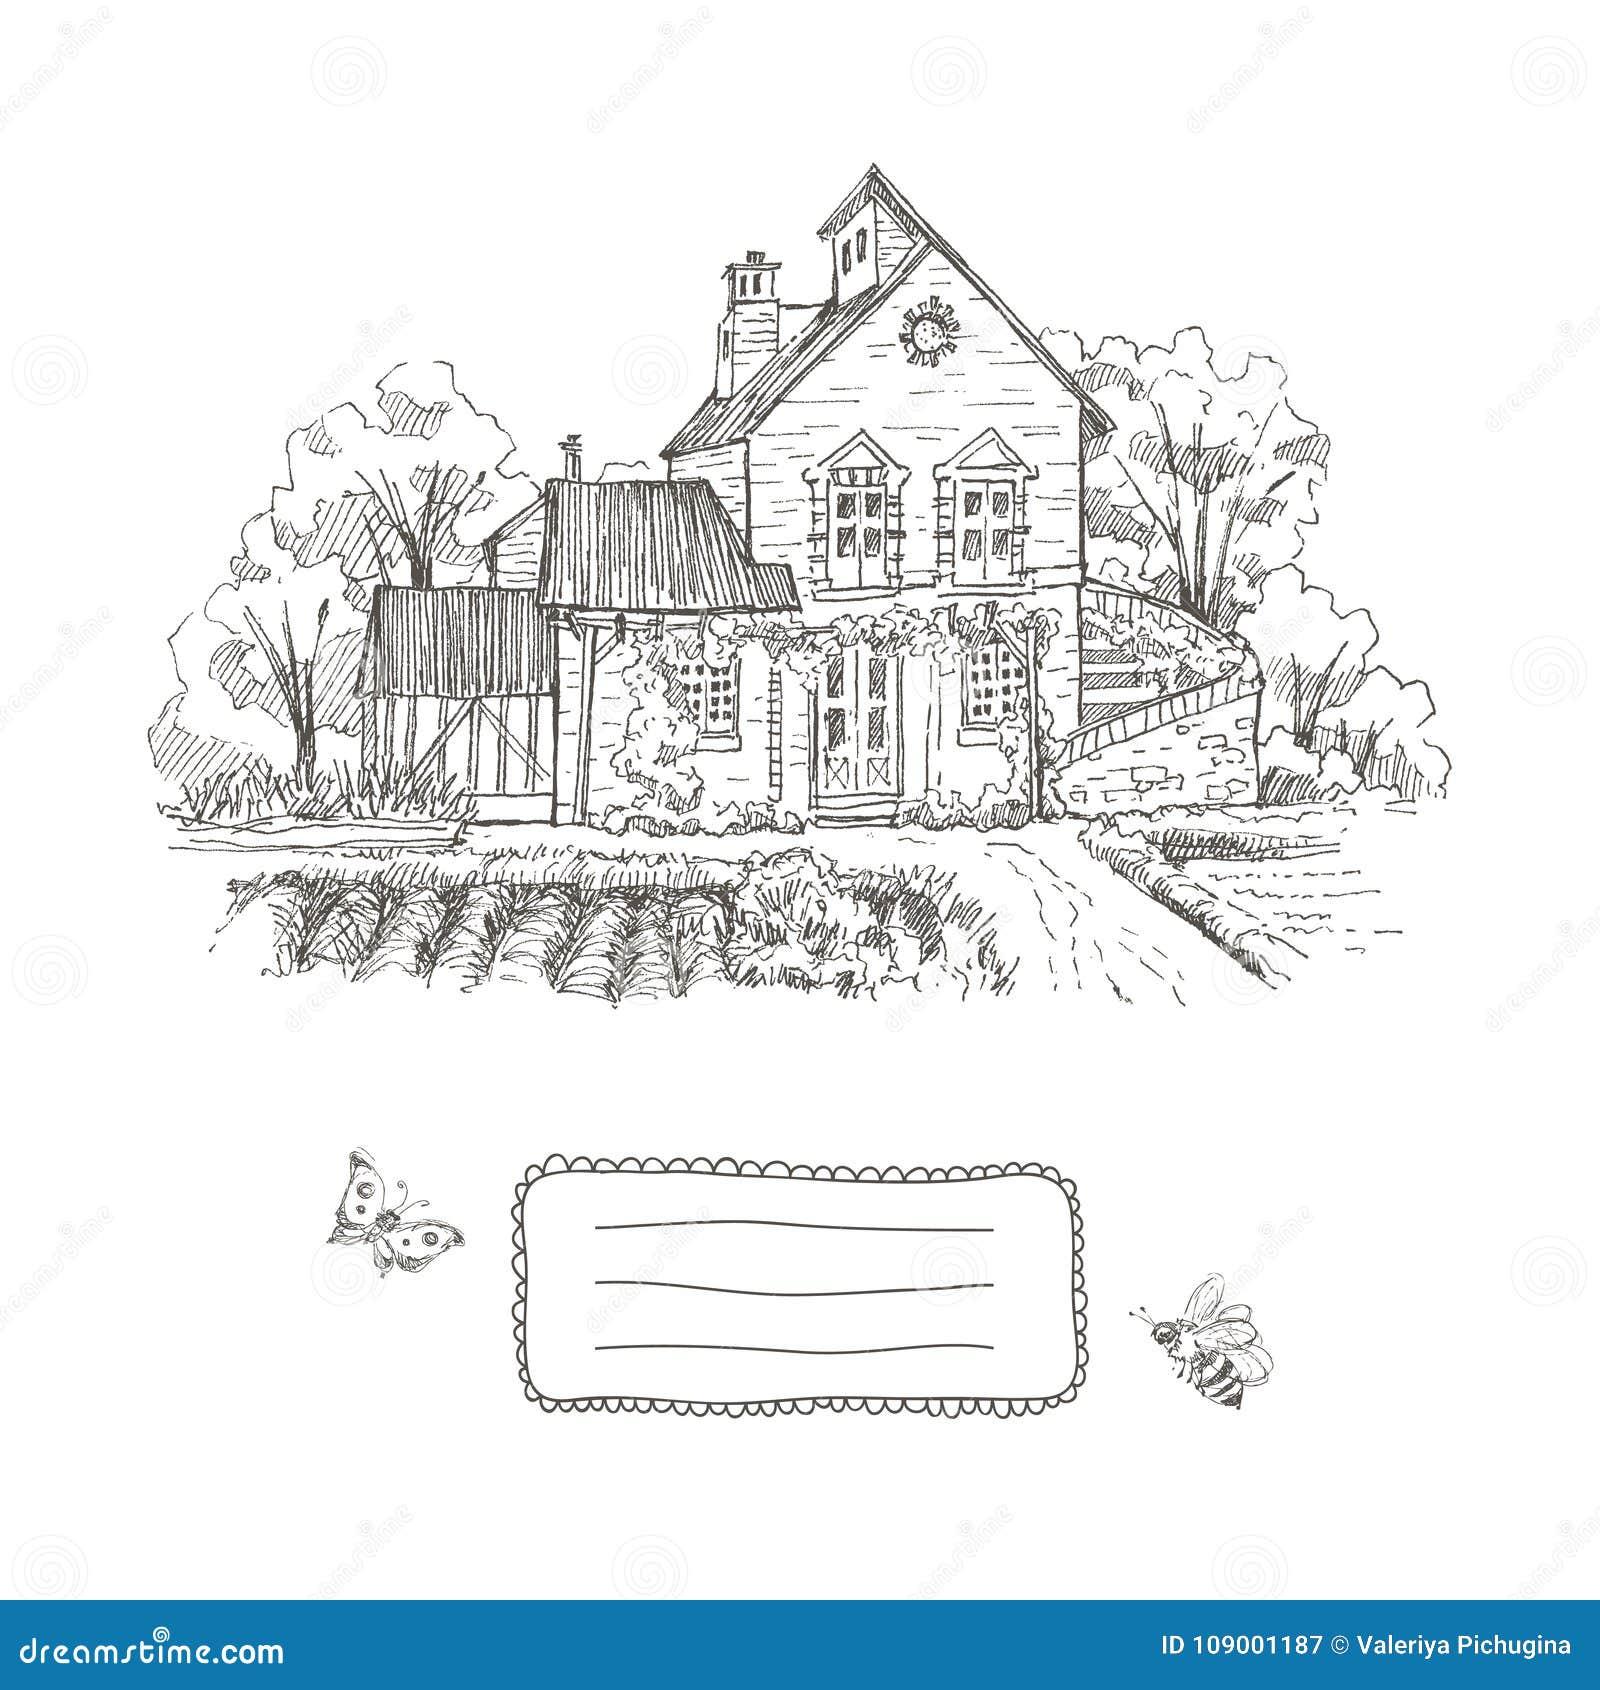 Old Farmhouse And Garden Illustration Frame For Text Hand Drawn Illustration Vector Design Stock Vector Illustration Of Historical Blossom 109001187